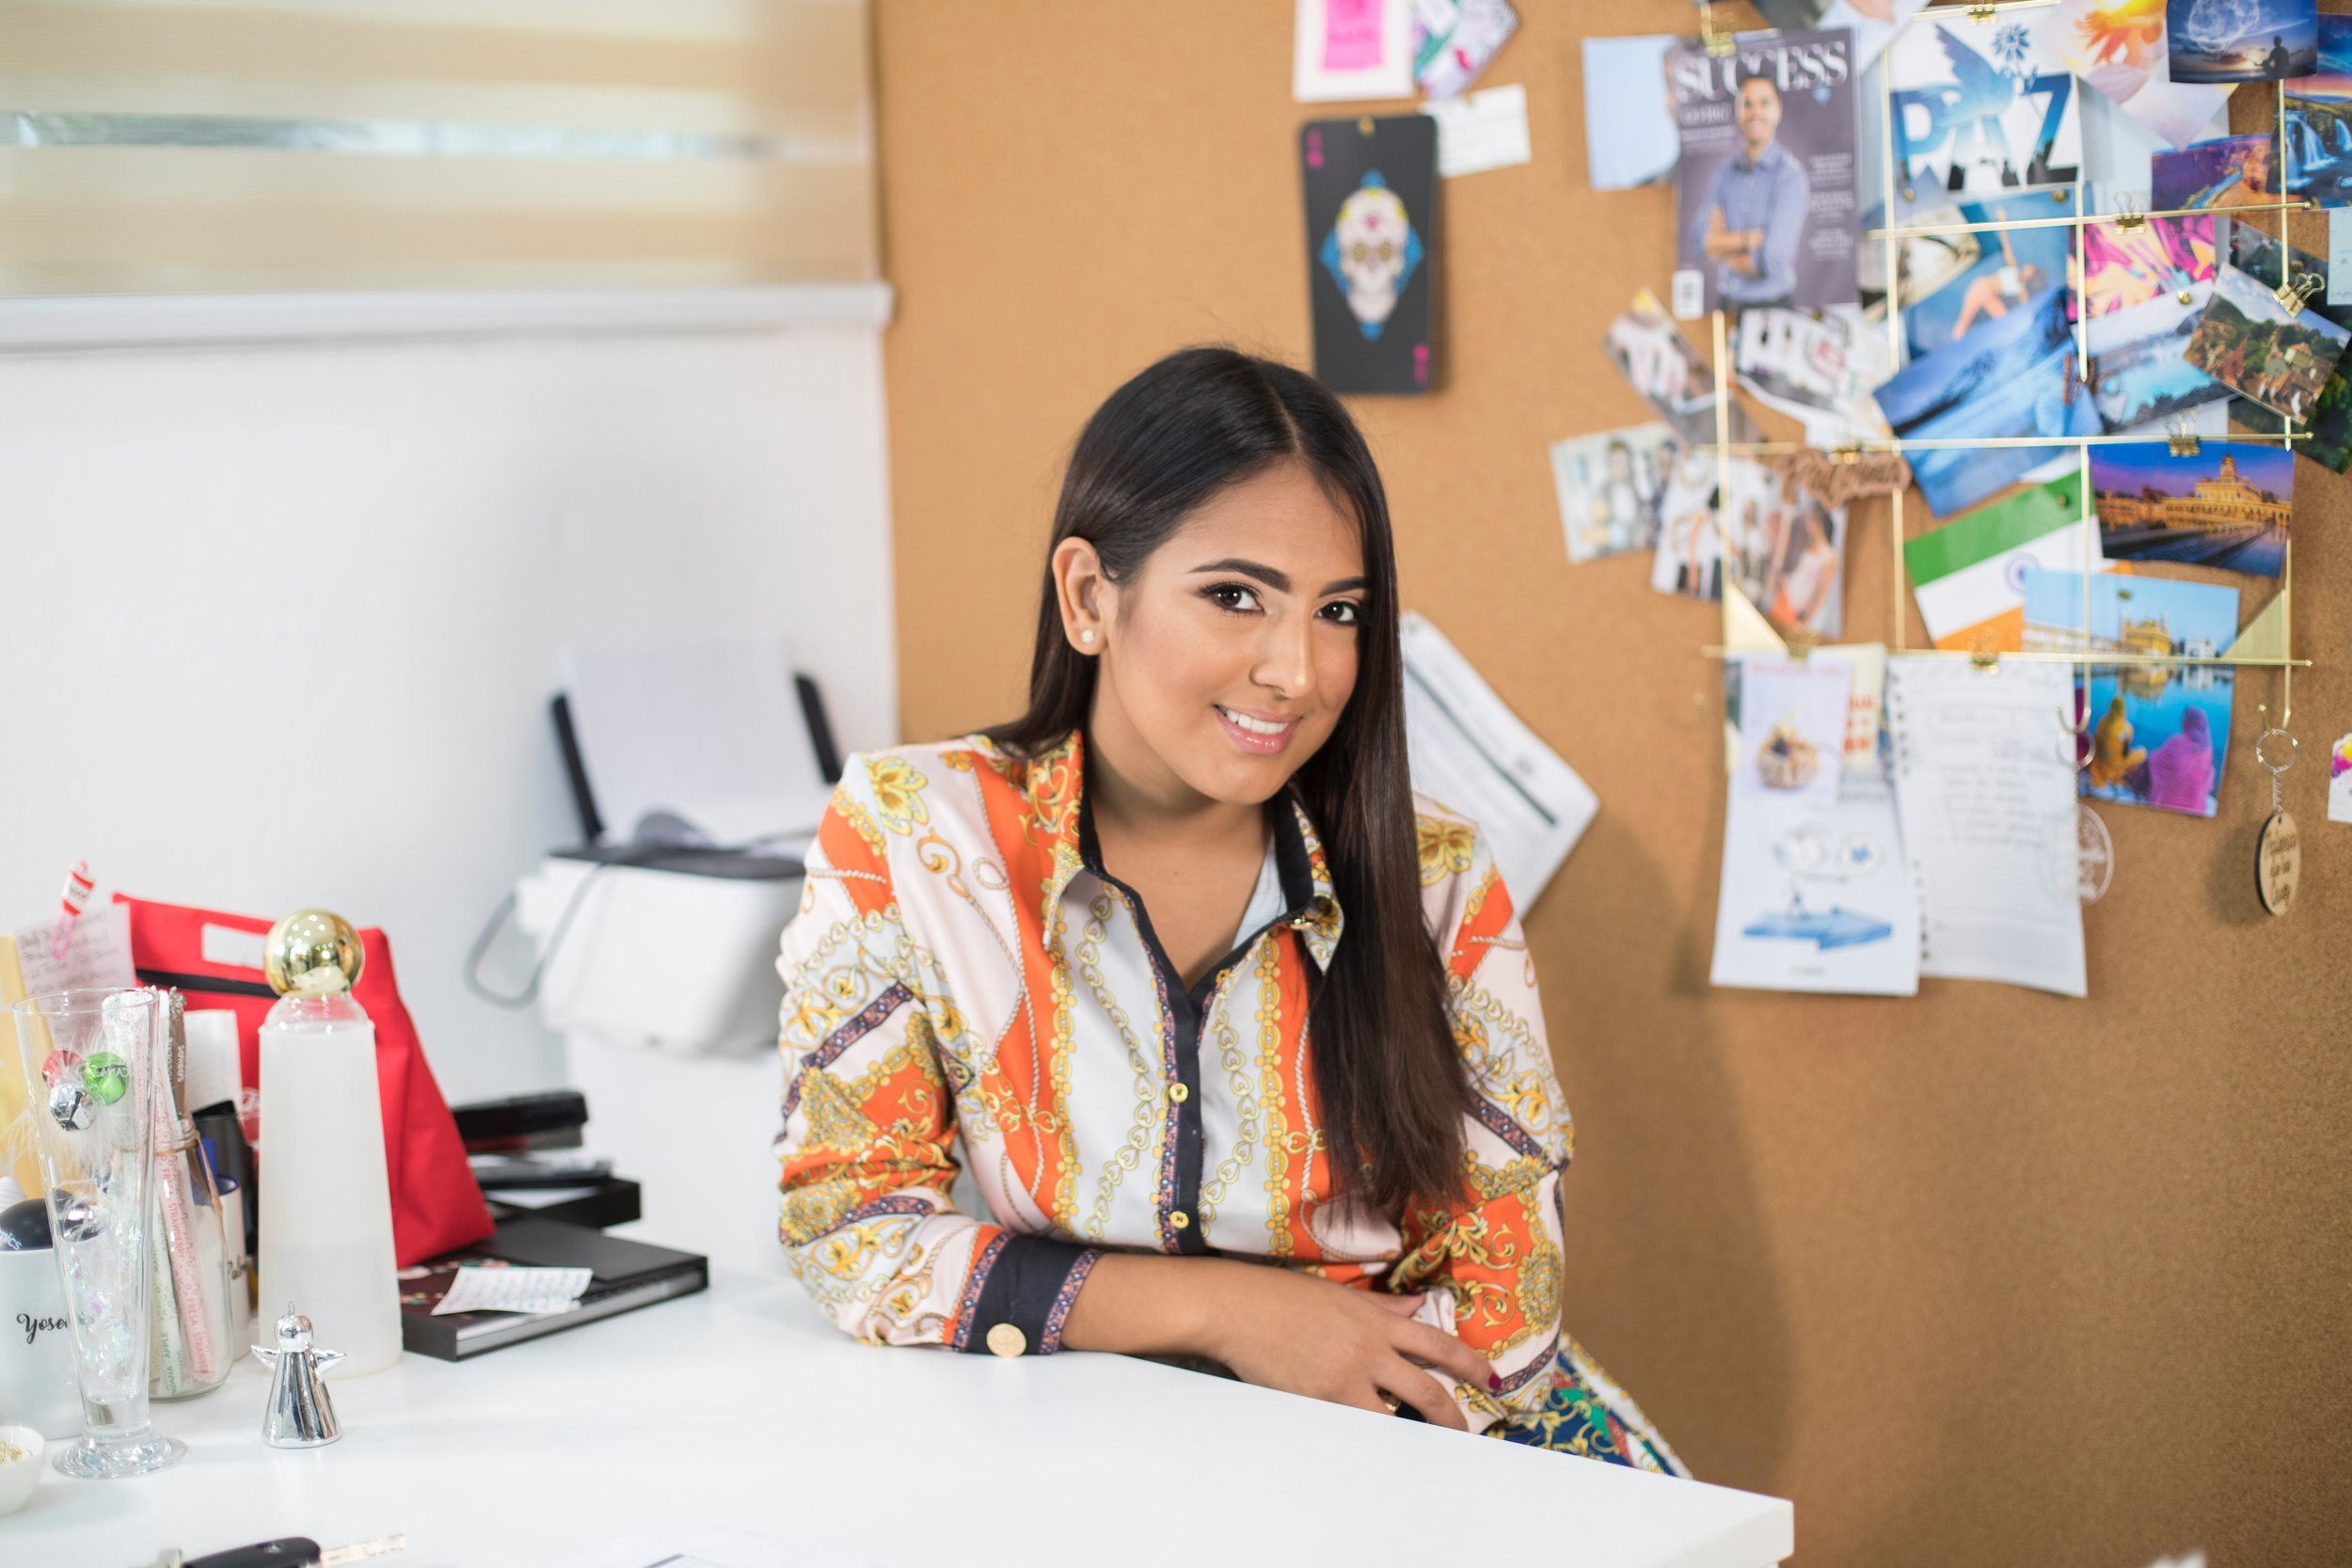 Paloma De la cruz fashion travel inspiration blogger coach millennial  dreams goals